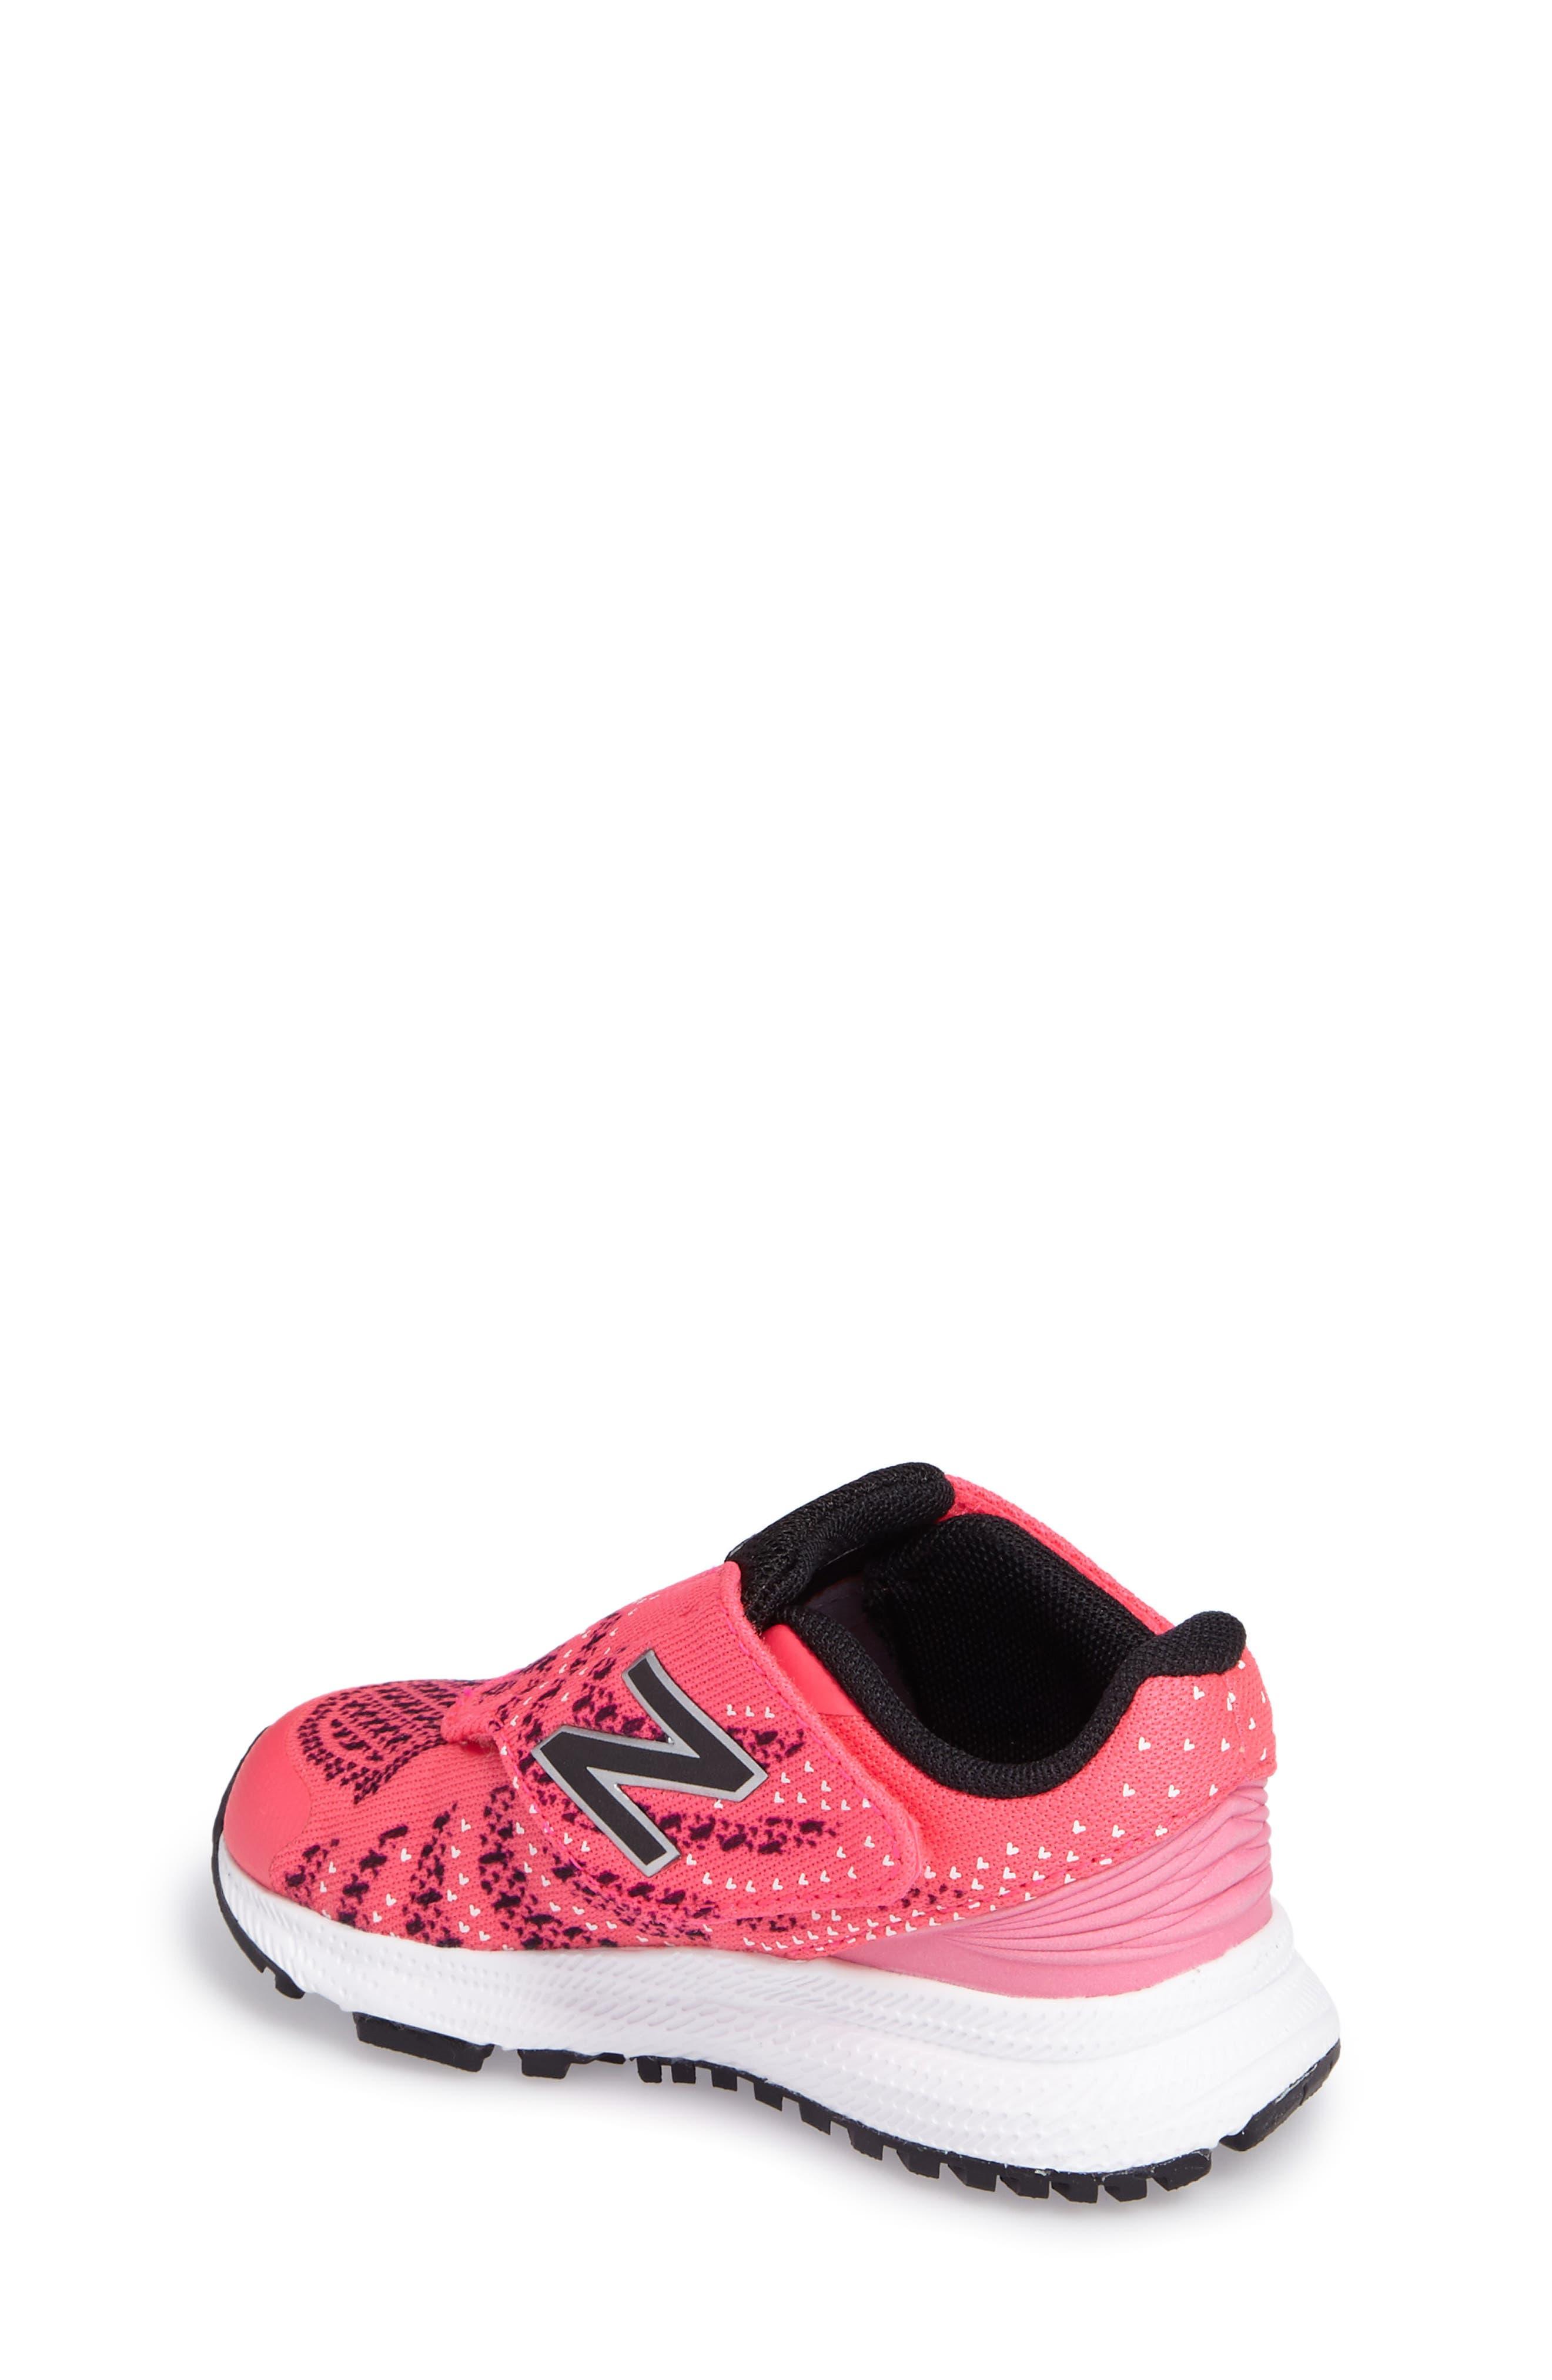 FuelCore Rush v3 Knit Sneaker,                             Alternate thumbnail 2, color,                             650